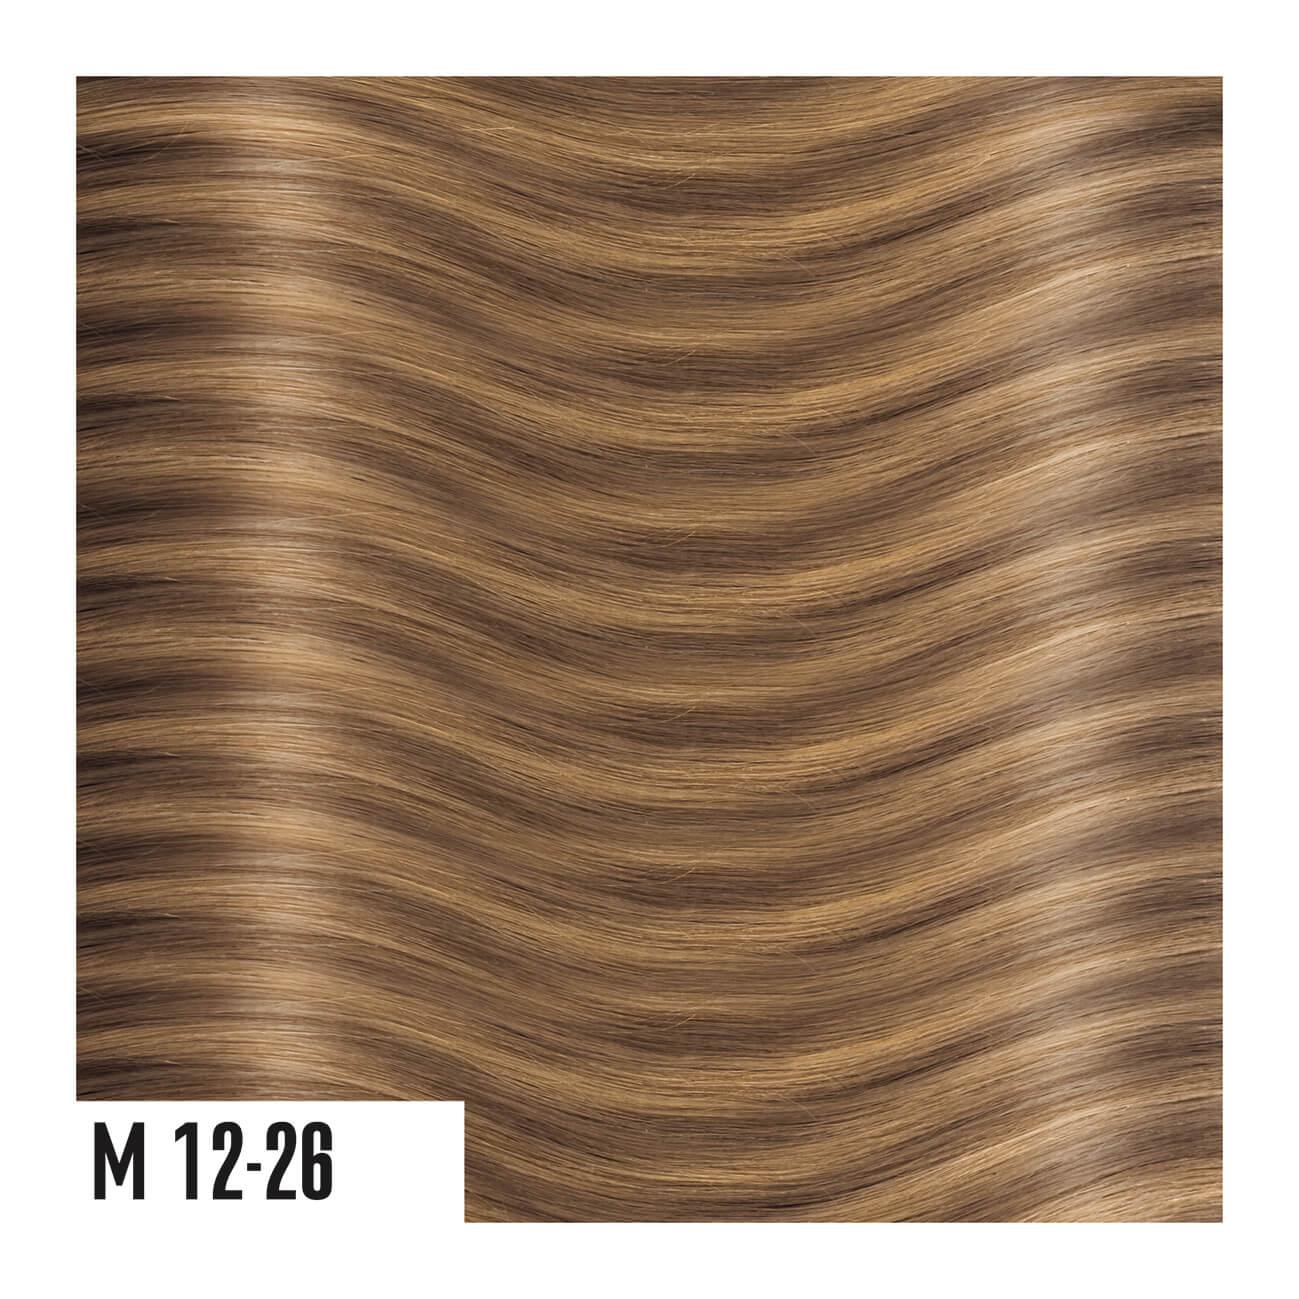 M12-26